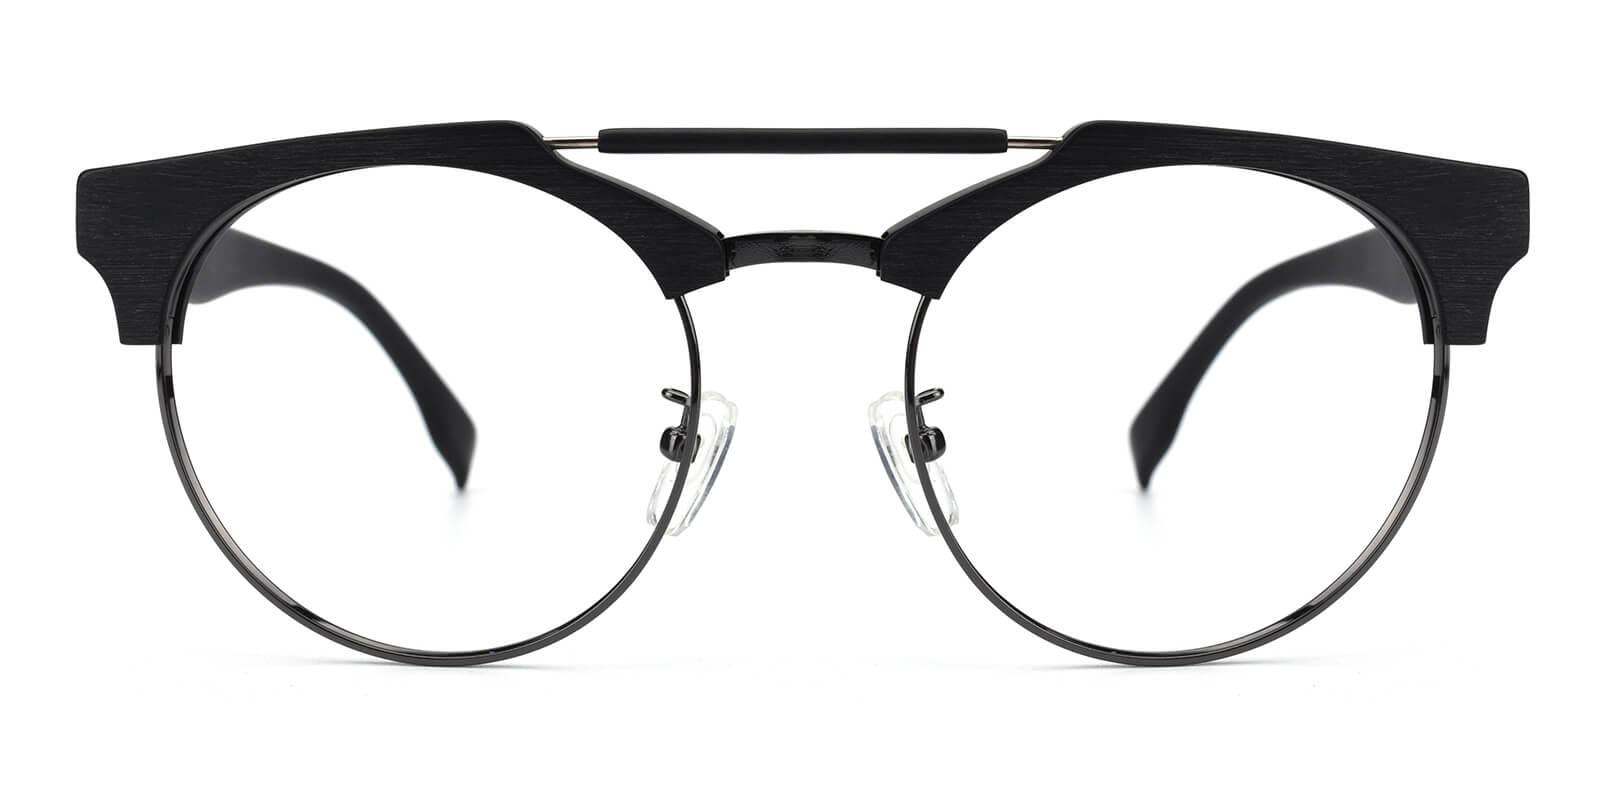 Ombama-Black-Browline-Combination-Eyeglasses-detail